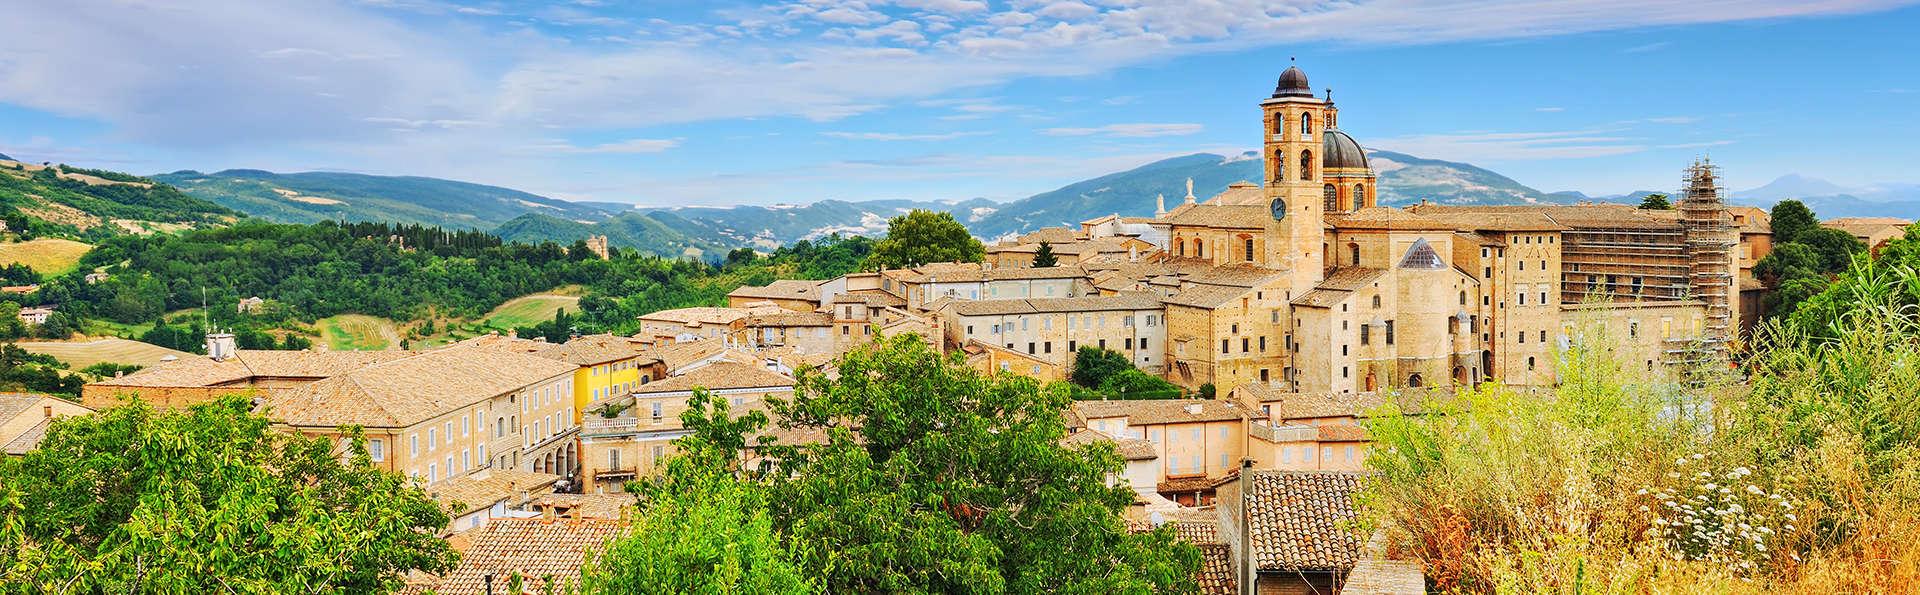 Urbino Resort - Tenuta Santi Giacomo e Filippo - edit_Fotolia_55236069_urbino.jpg